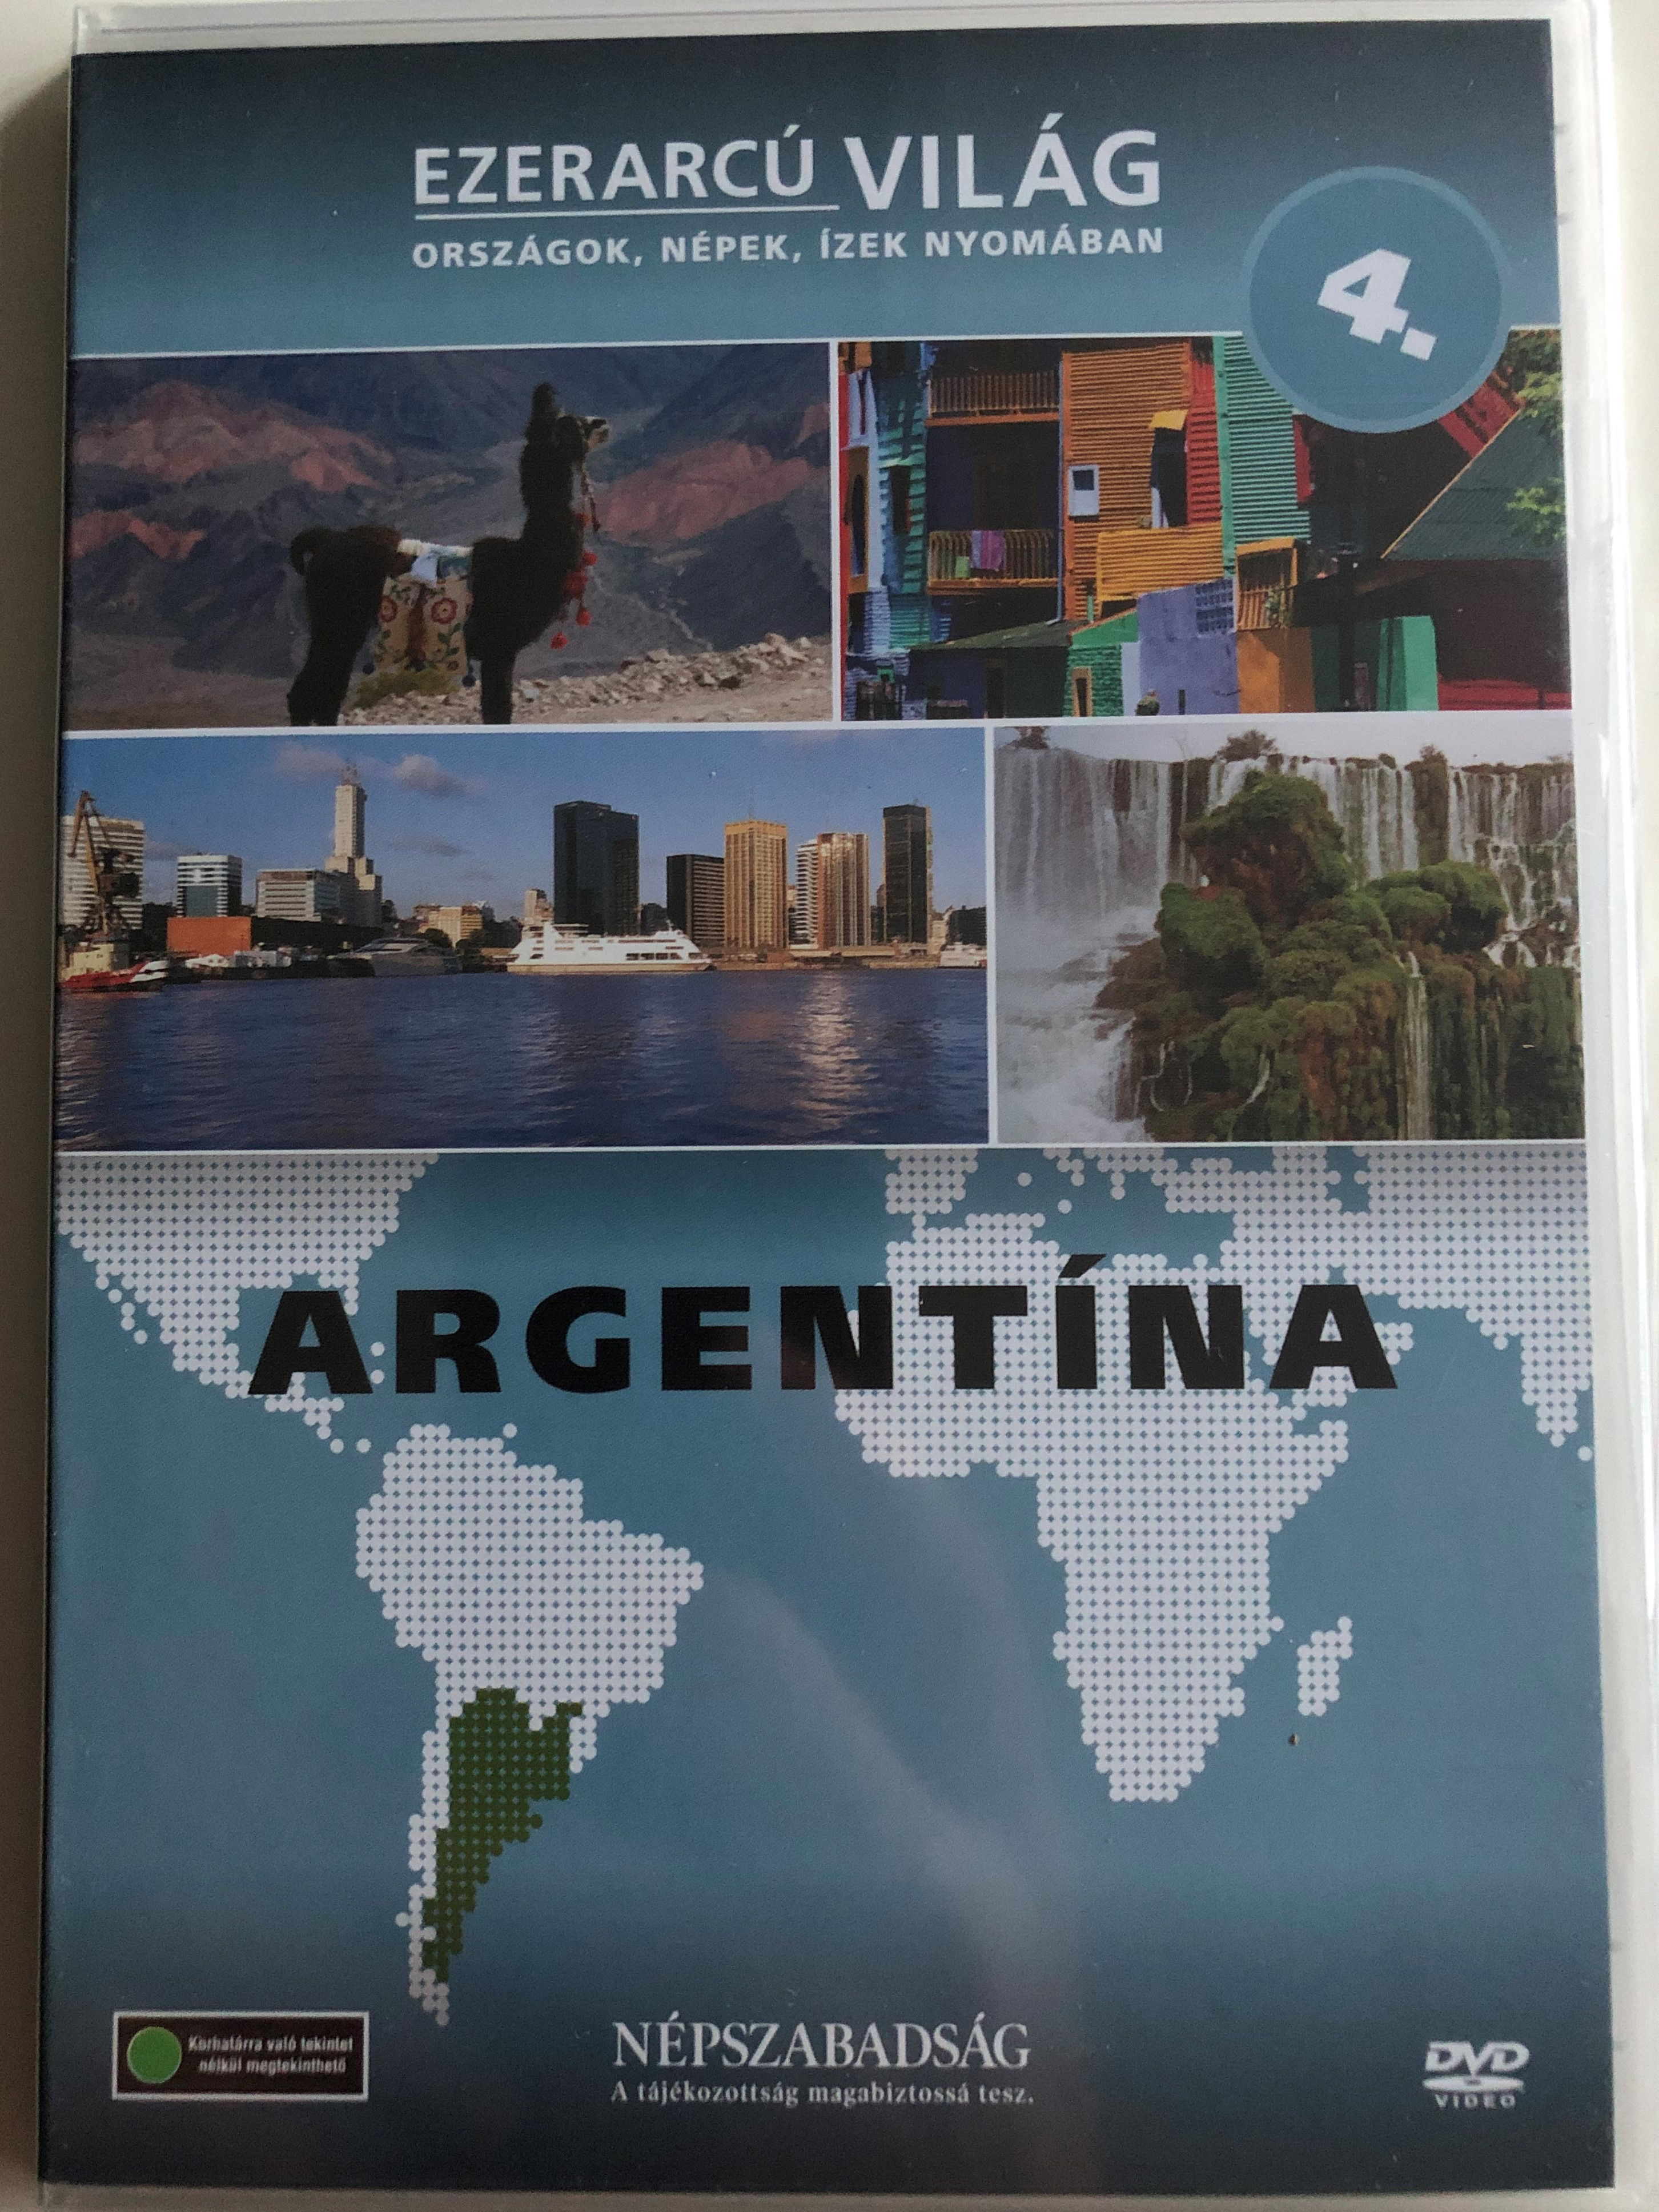 ezerarc-vil-g-vol.-4-argentina-dvd-2009-orsz-gok-n-pek-zek-nyom-ban-20-x-dvd-set-2009-n-pszabads-g-premier-media-pilot-film-documentary-series-about-our-world-1-.jpg